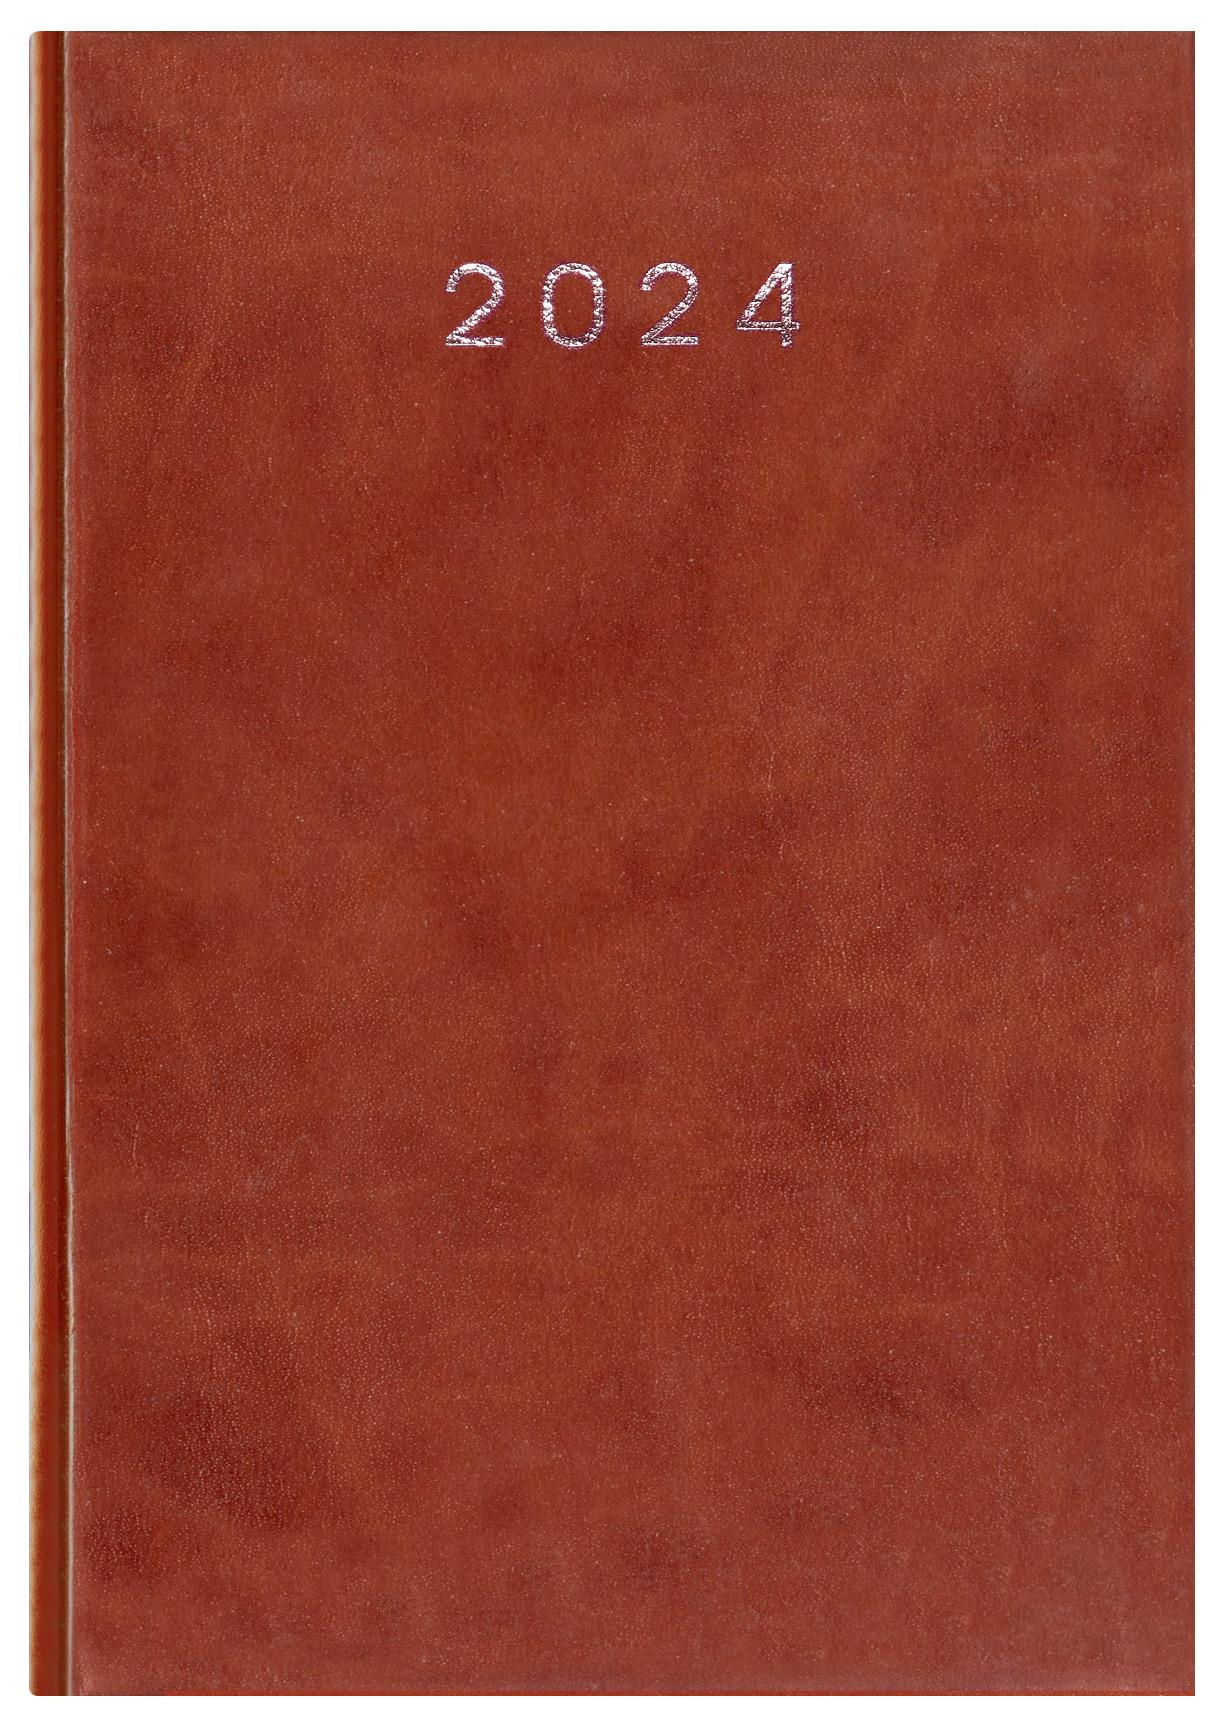 Kalendarz Siena